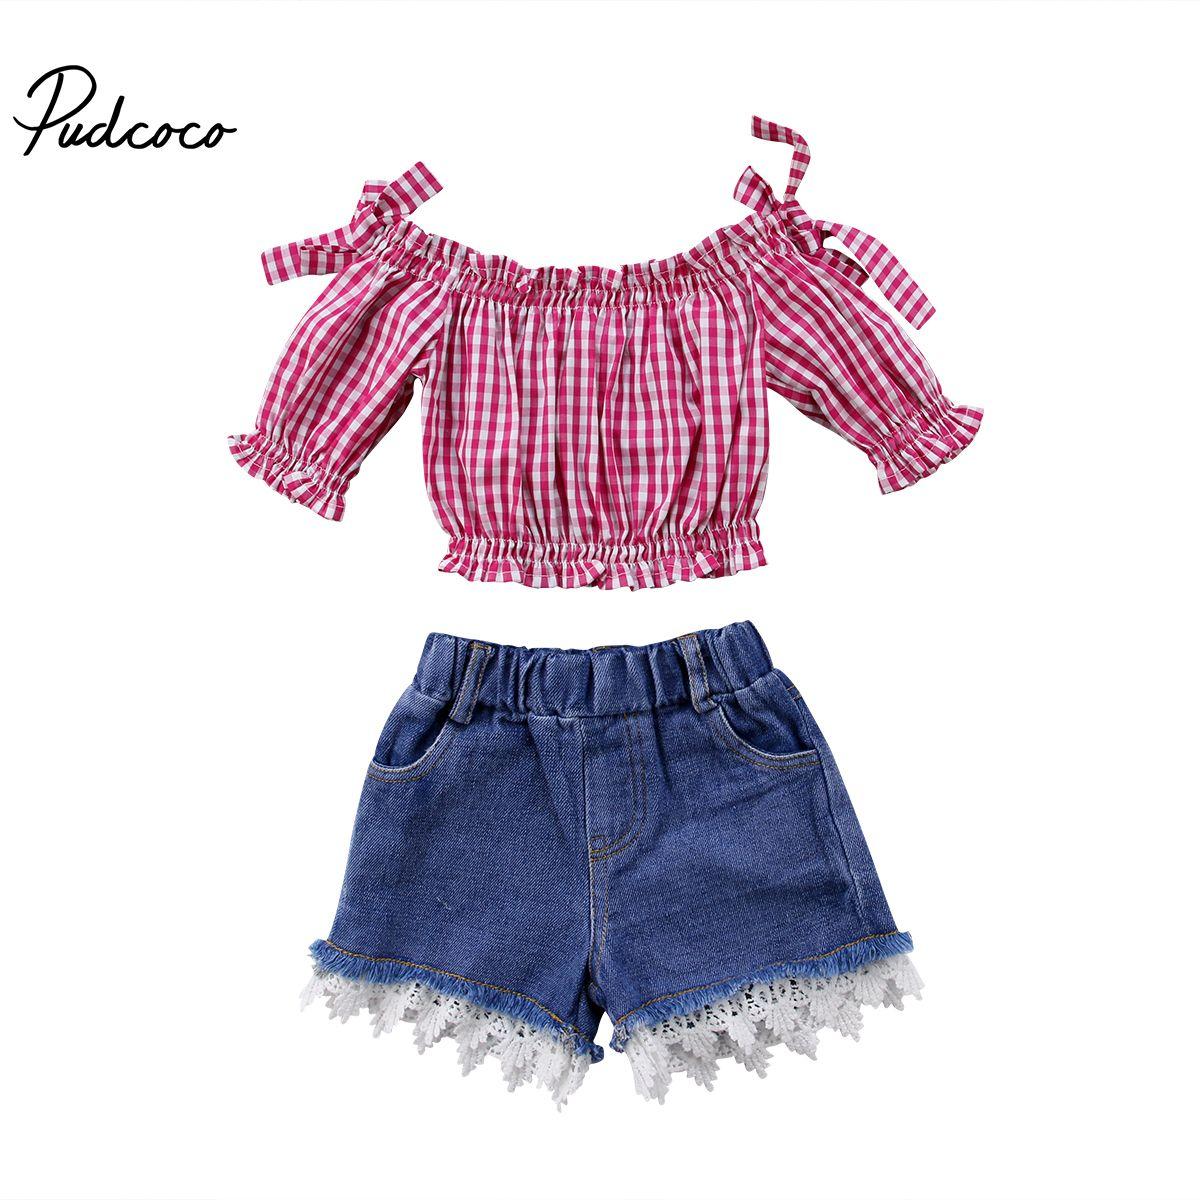 Newborn Baby Girls Off Shoulder Shirt Crop Top Shorts Pants Outfits Clothes Set